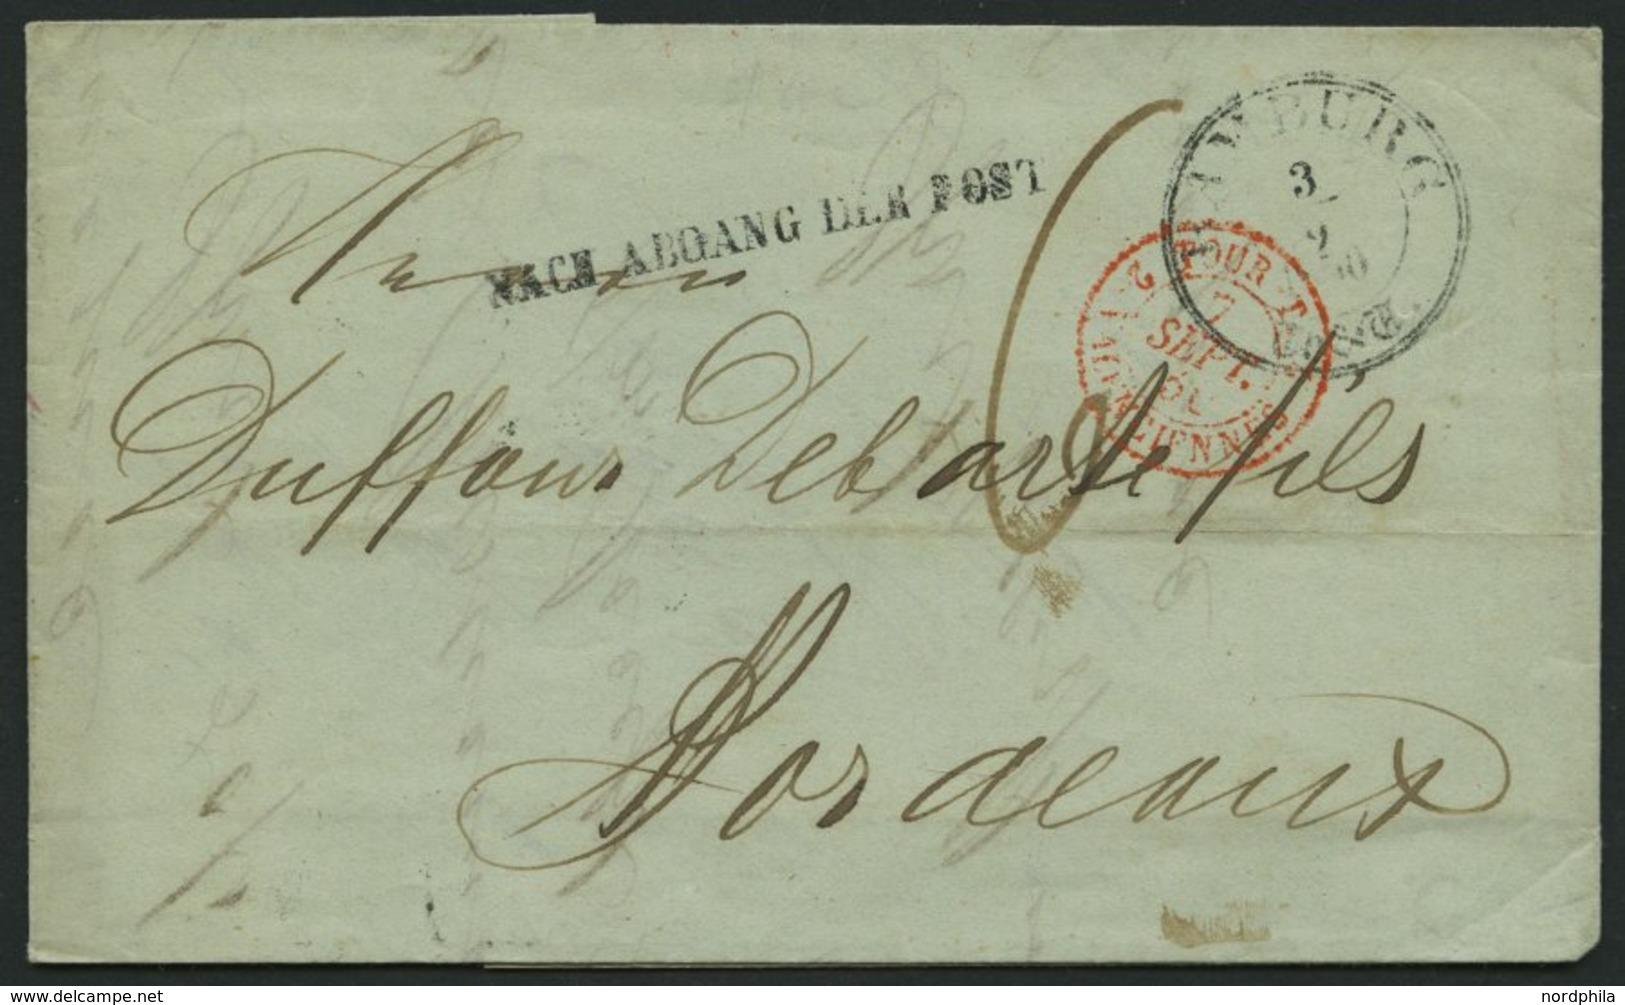 HAMBURG - THURN UND TAXISCHES O.P.A. 1850, HAMBURG Th.& T., K3 Auf Brief Nach Bordeaux, Forwarded-Letter Von Nottebohm & - Thurn And Taxis